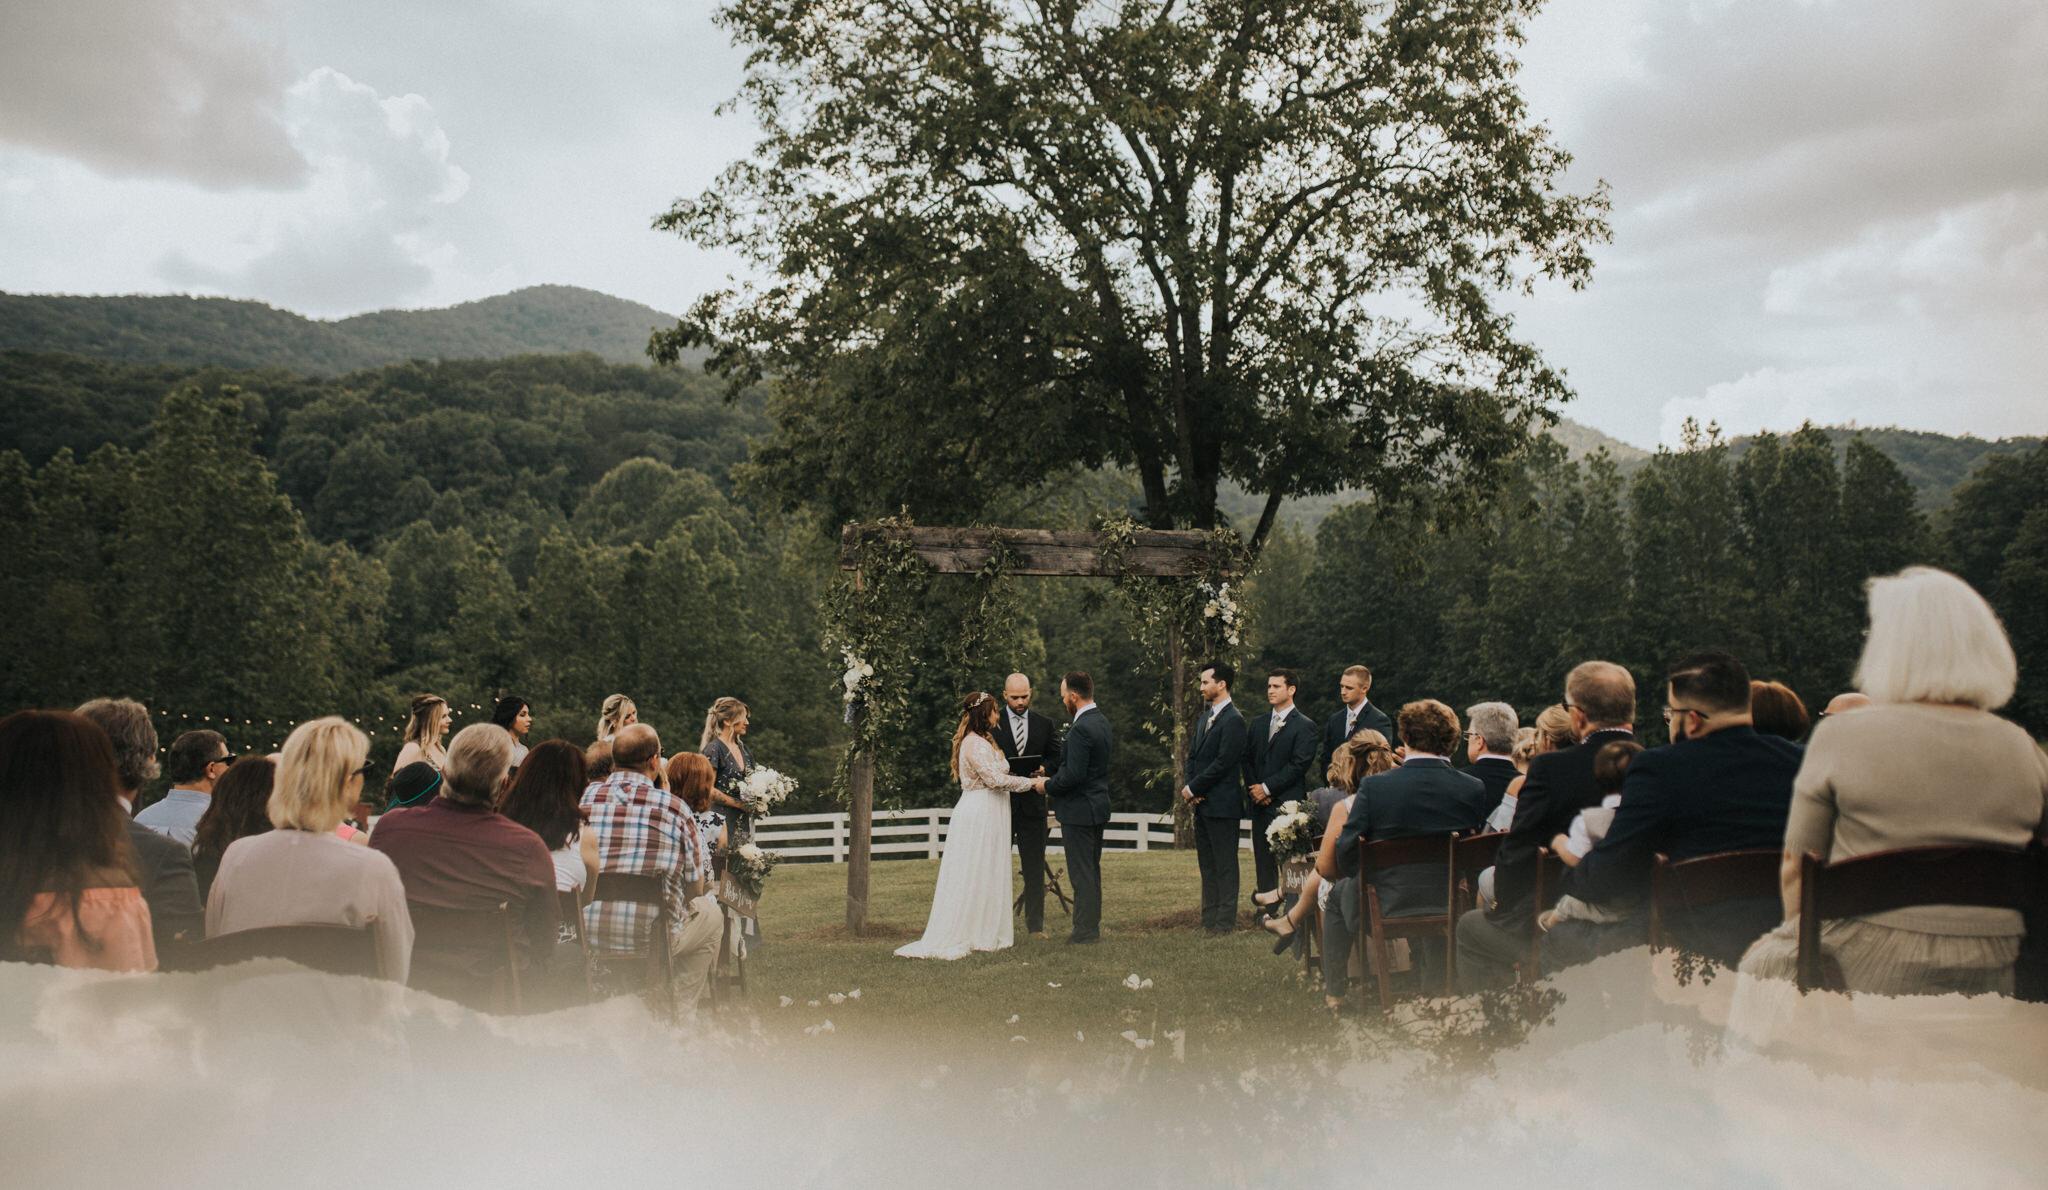 KateMatt-North-Georgia-Wedding-Photographer-Mountain-Laurel-Farm-103.jpg